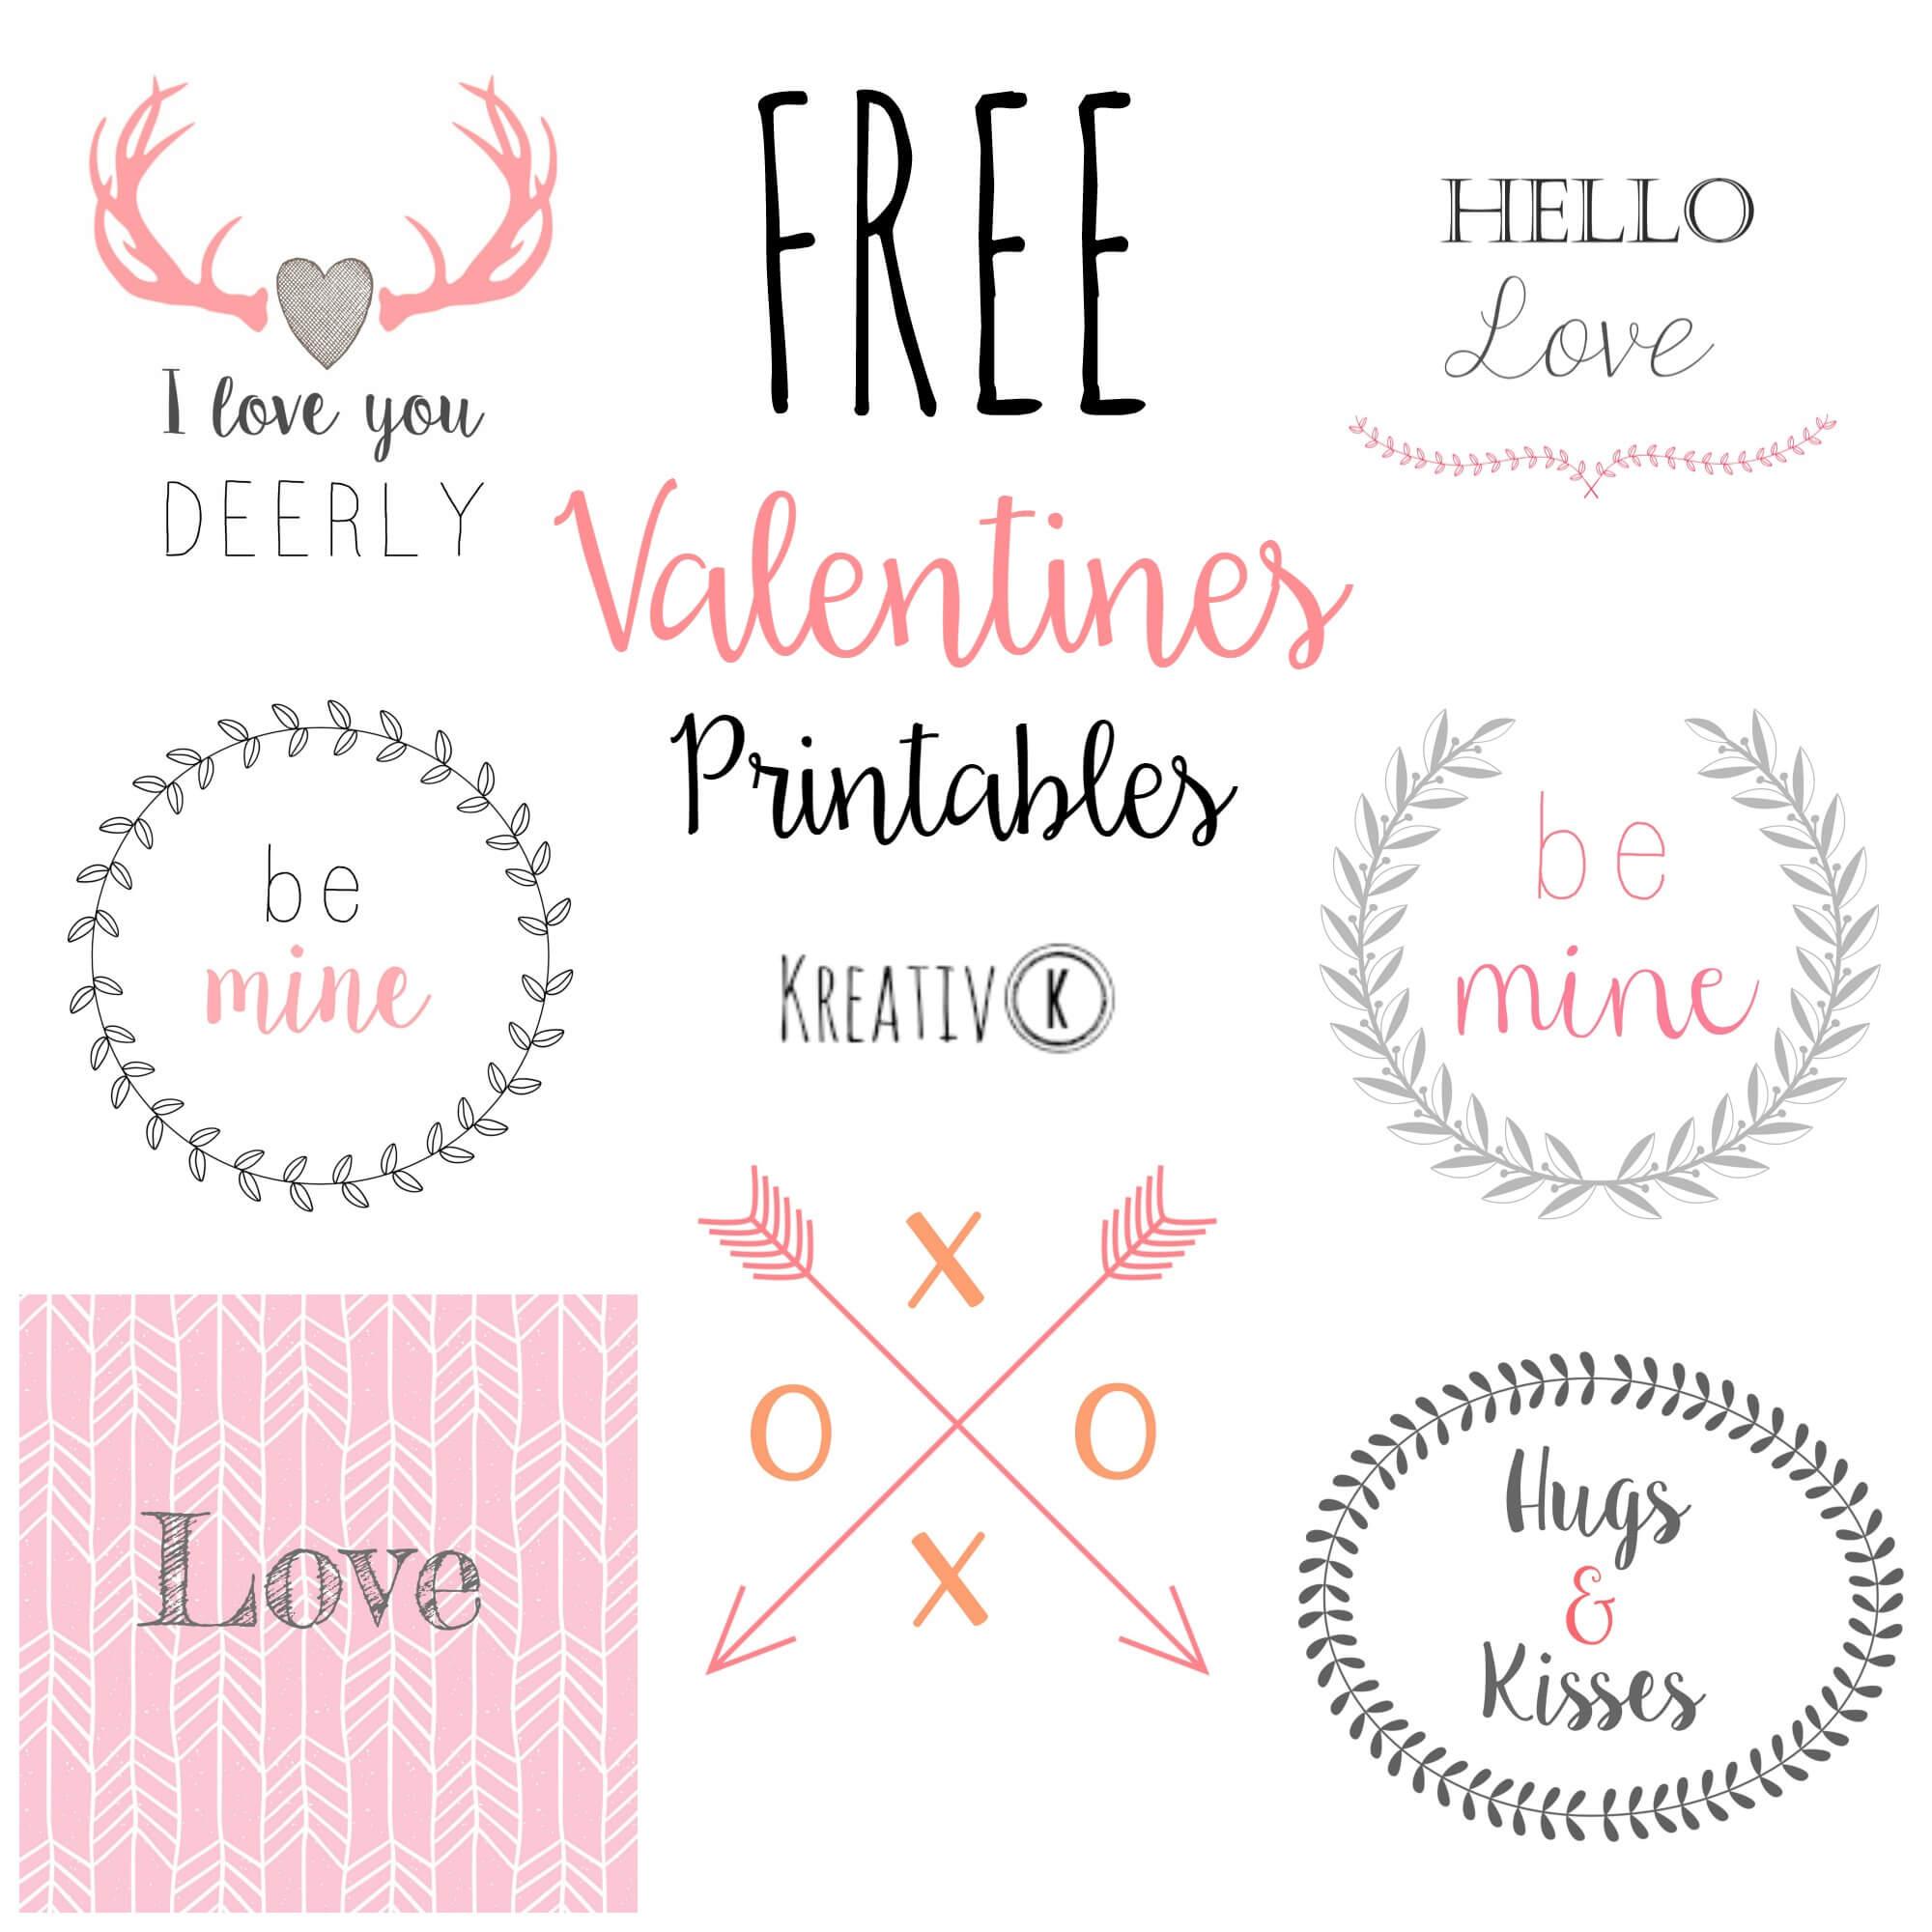 Free-Valentines-Printables-1